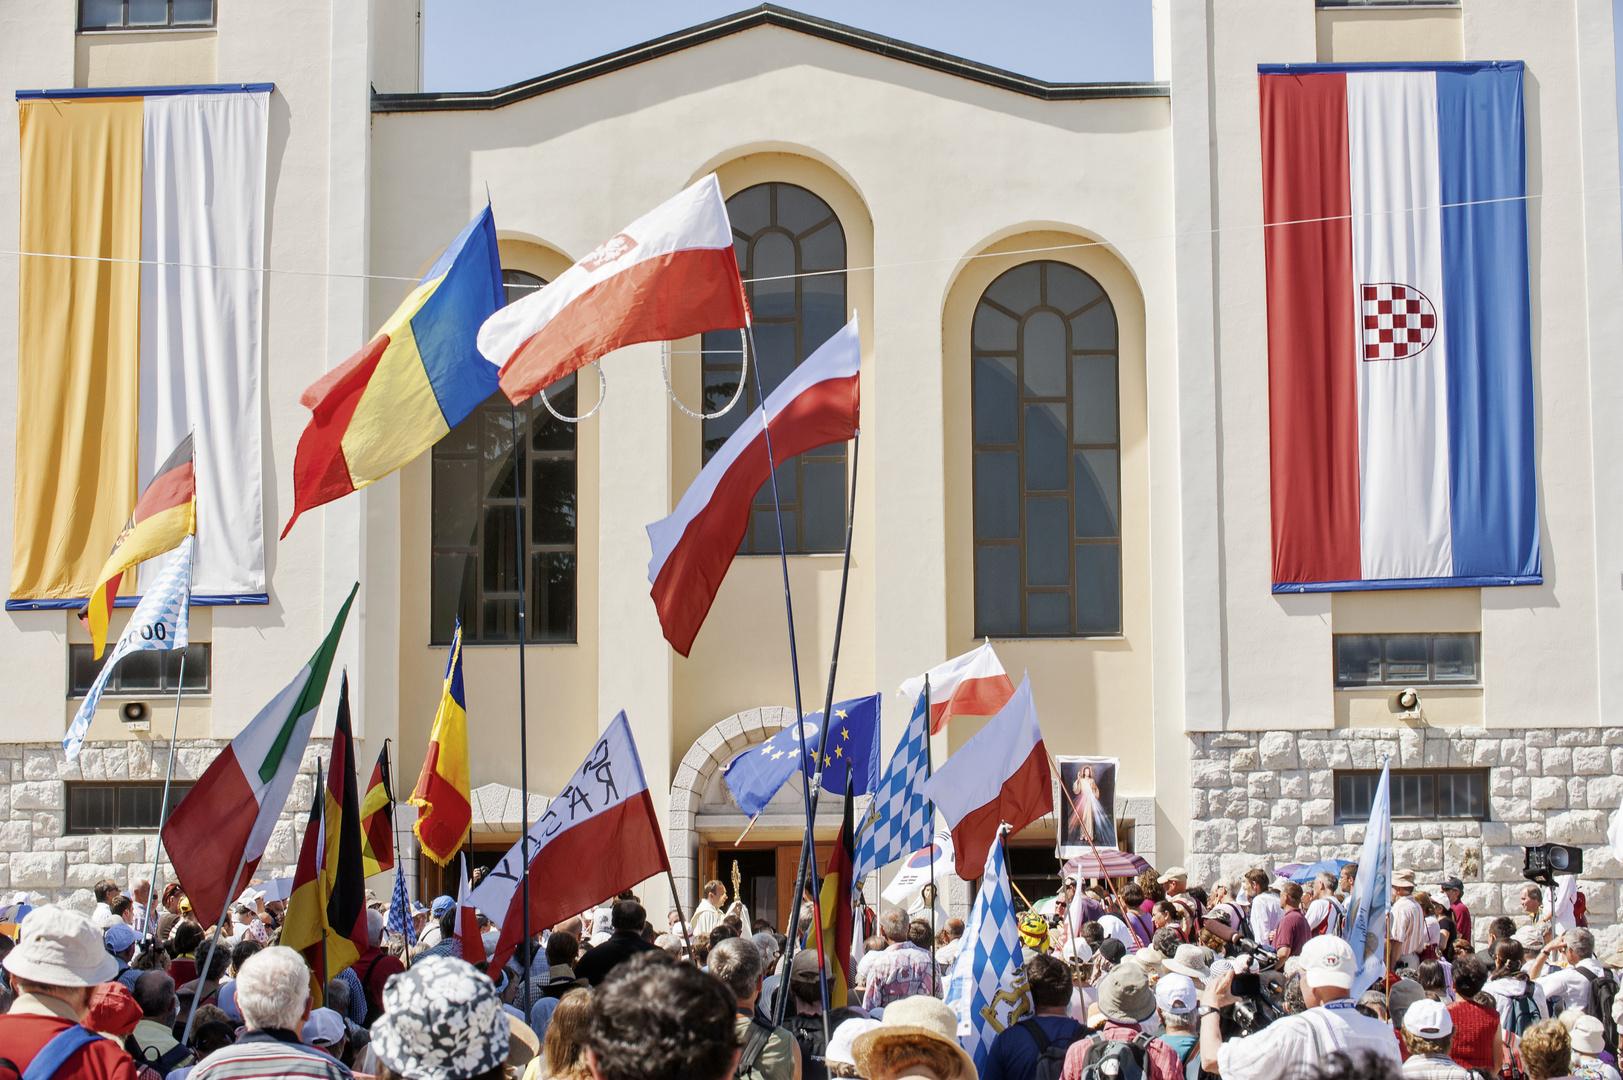 Pilgergottesdienst in Medjugorje